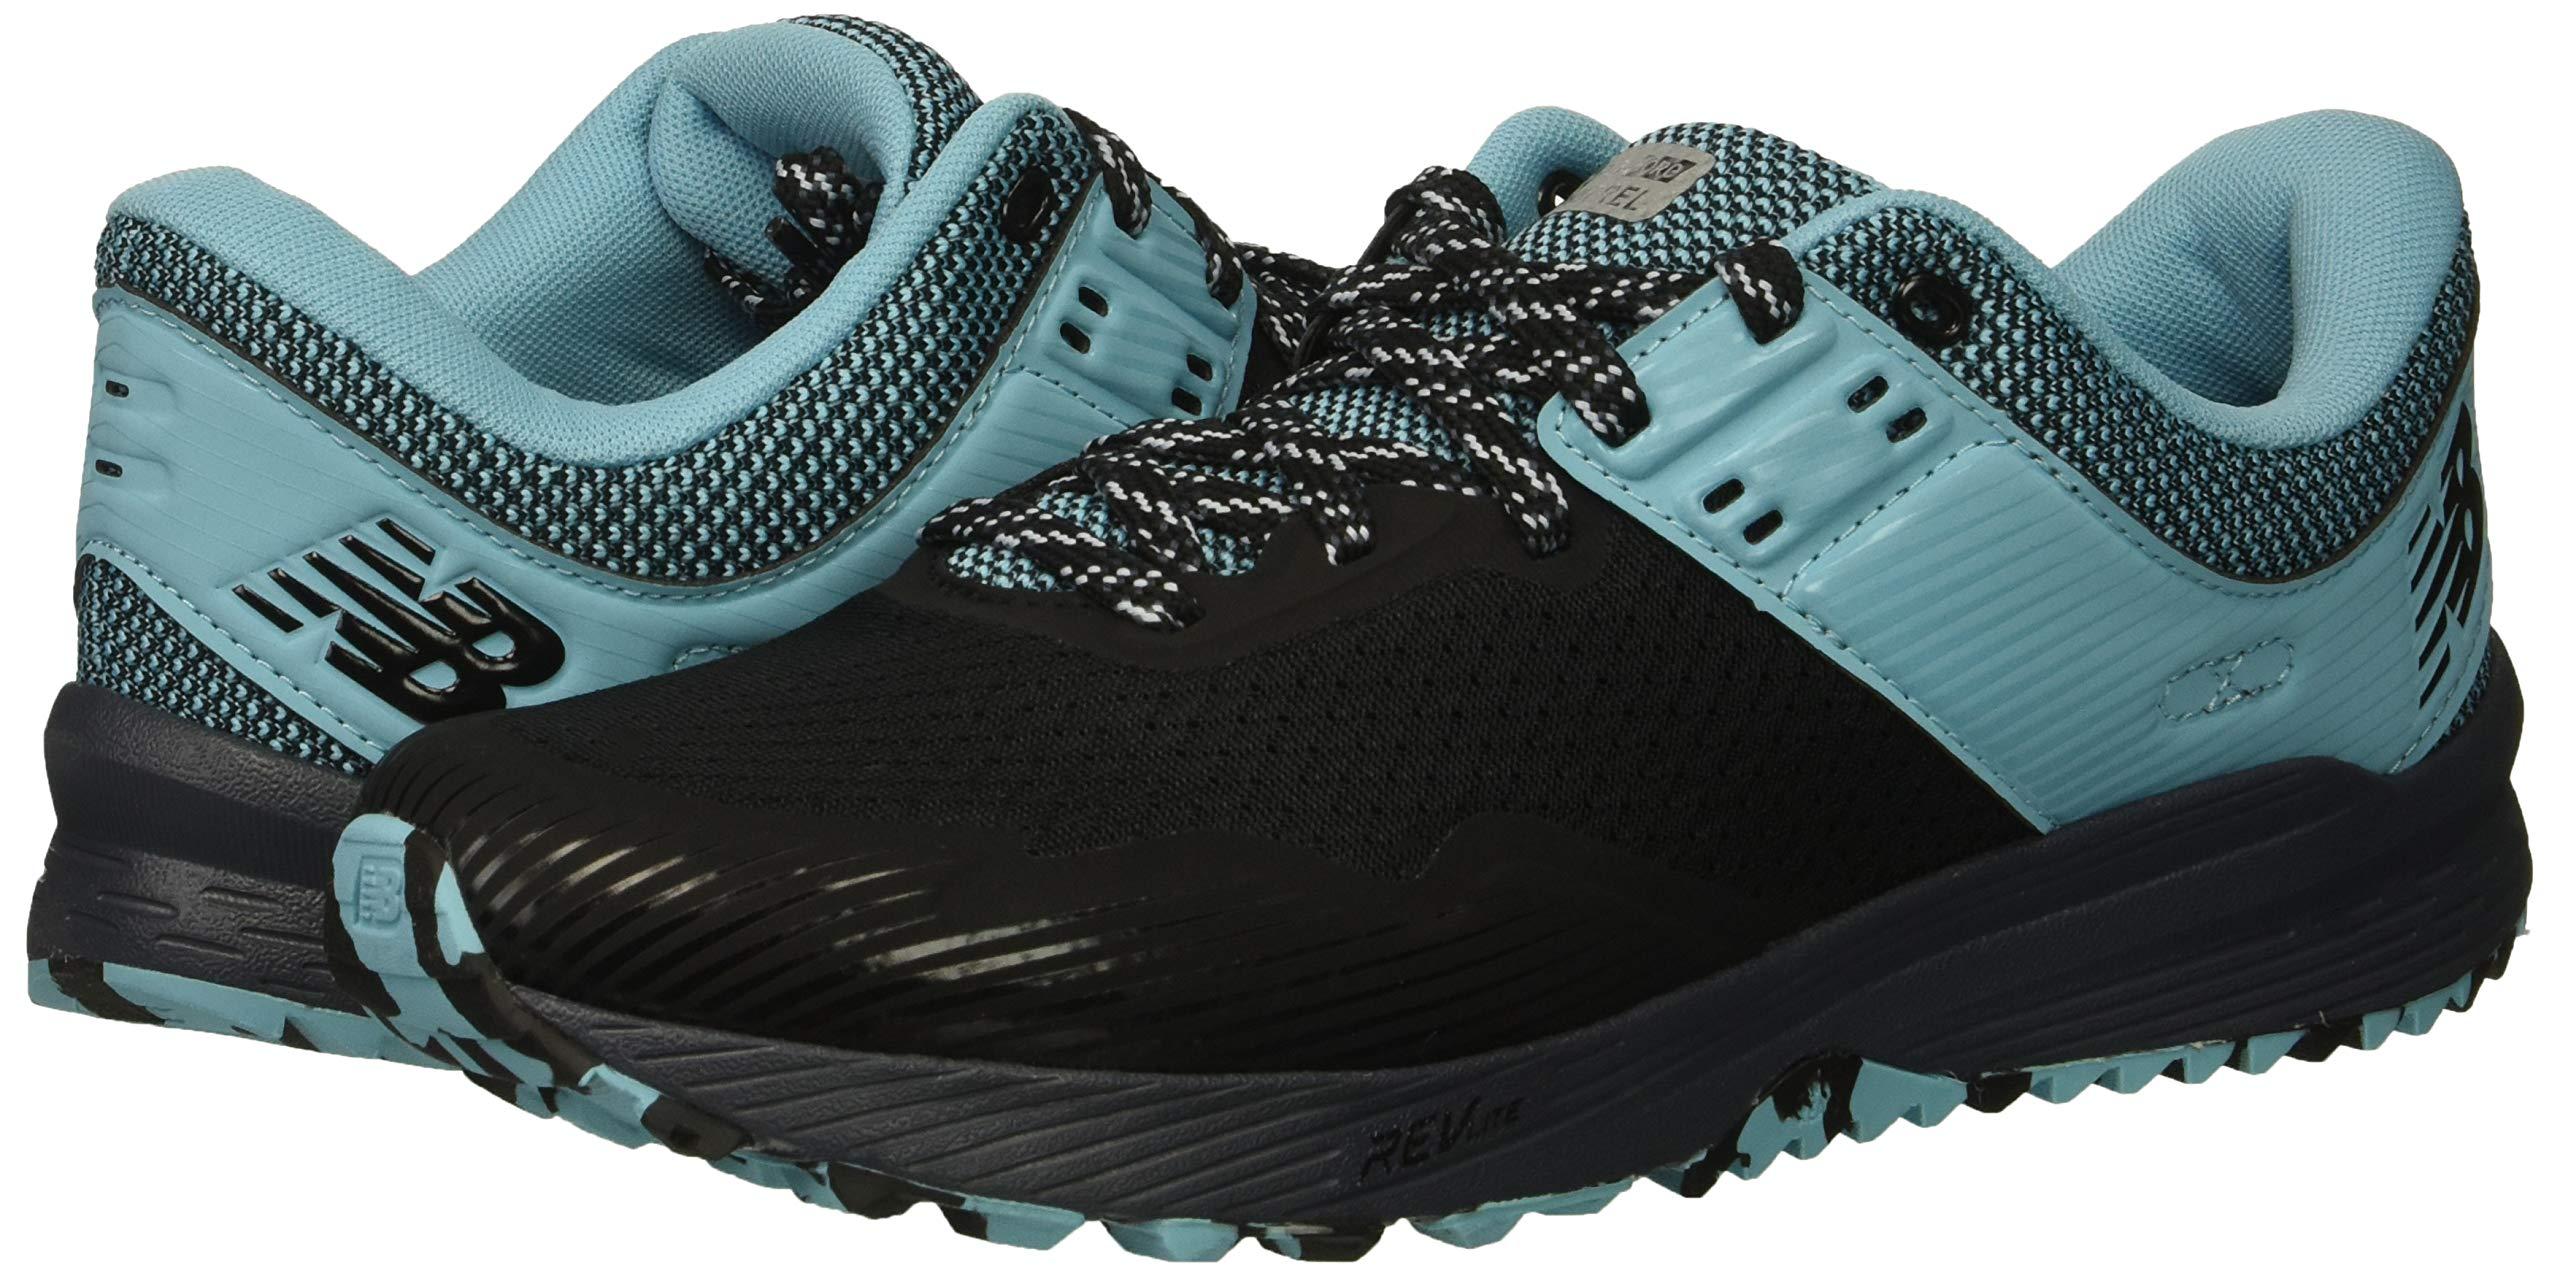 New Balance Women's Nitrel V2 FuelCore Trail Running Shoe Black/Thunder/Enamel Blue 5.5 B US by New Balance (Image #6)